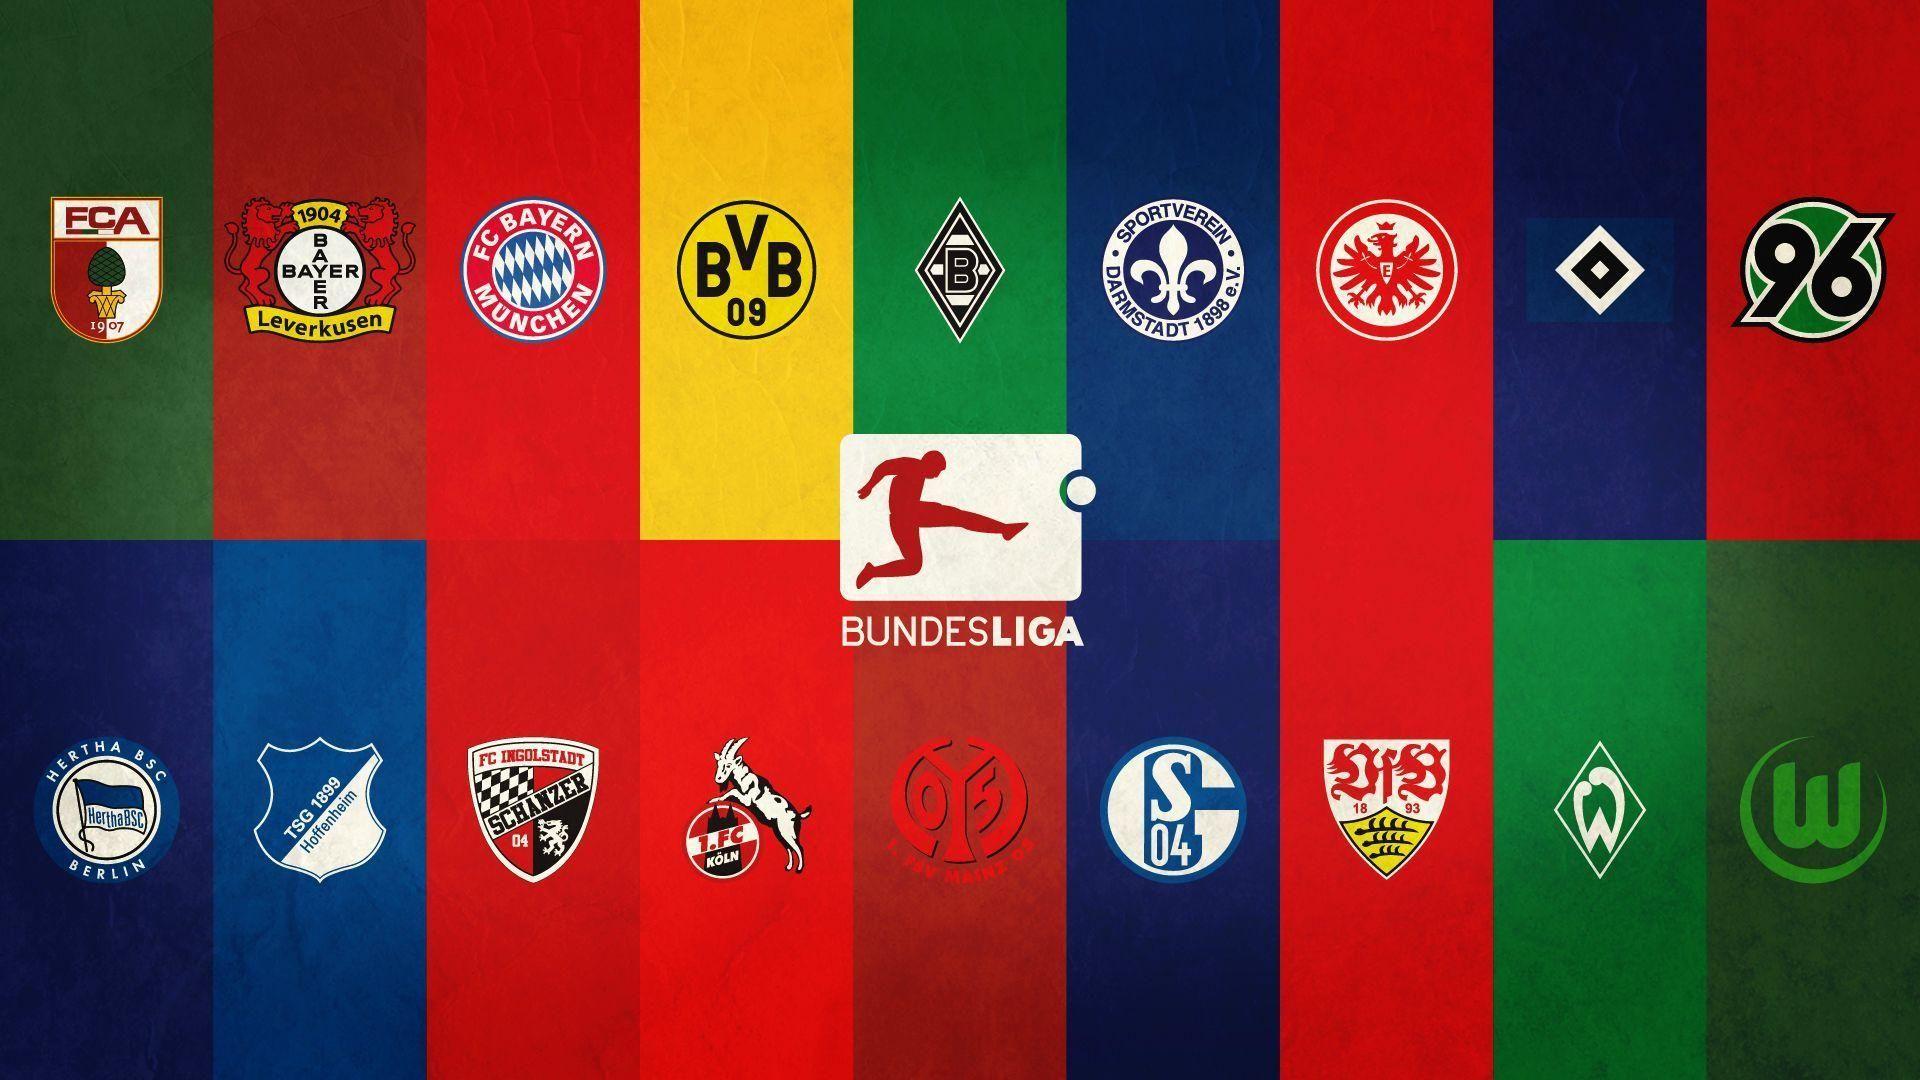 Fussball Ausmalbilder Bundesliga 1ausmalbilder Com Football Streaming German Football League Football Images